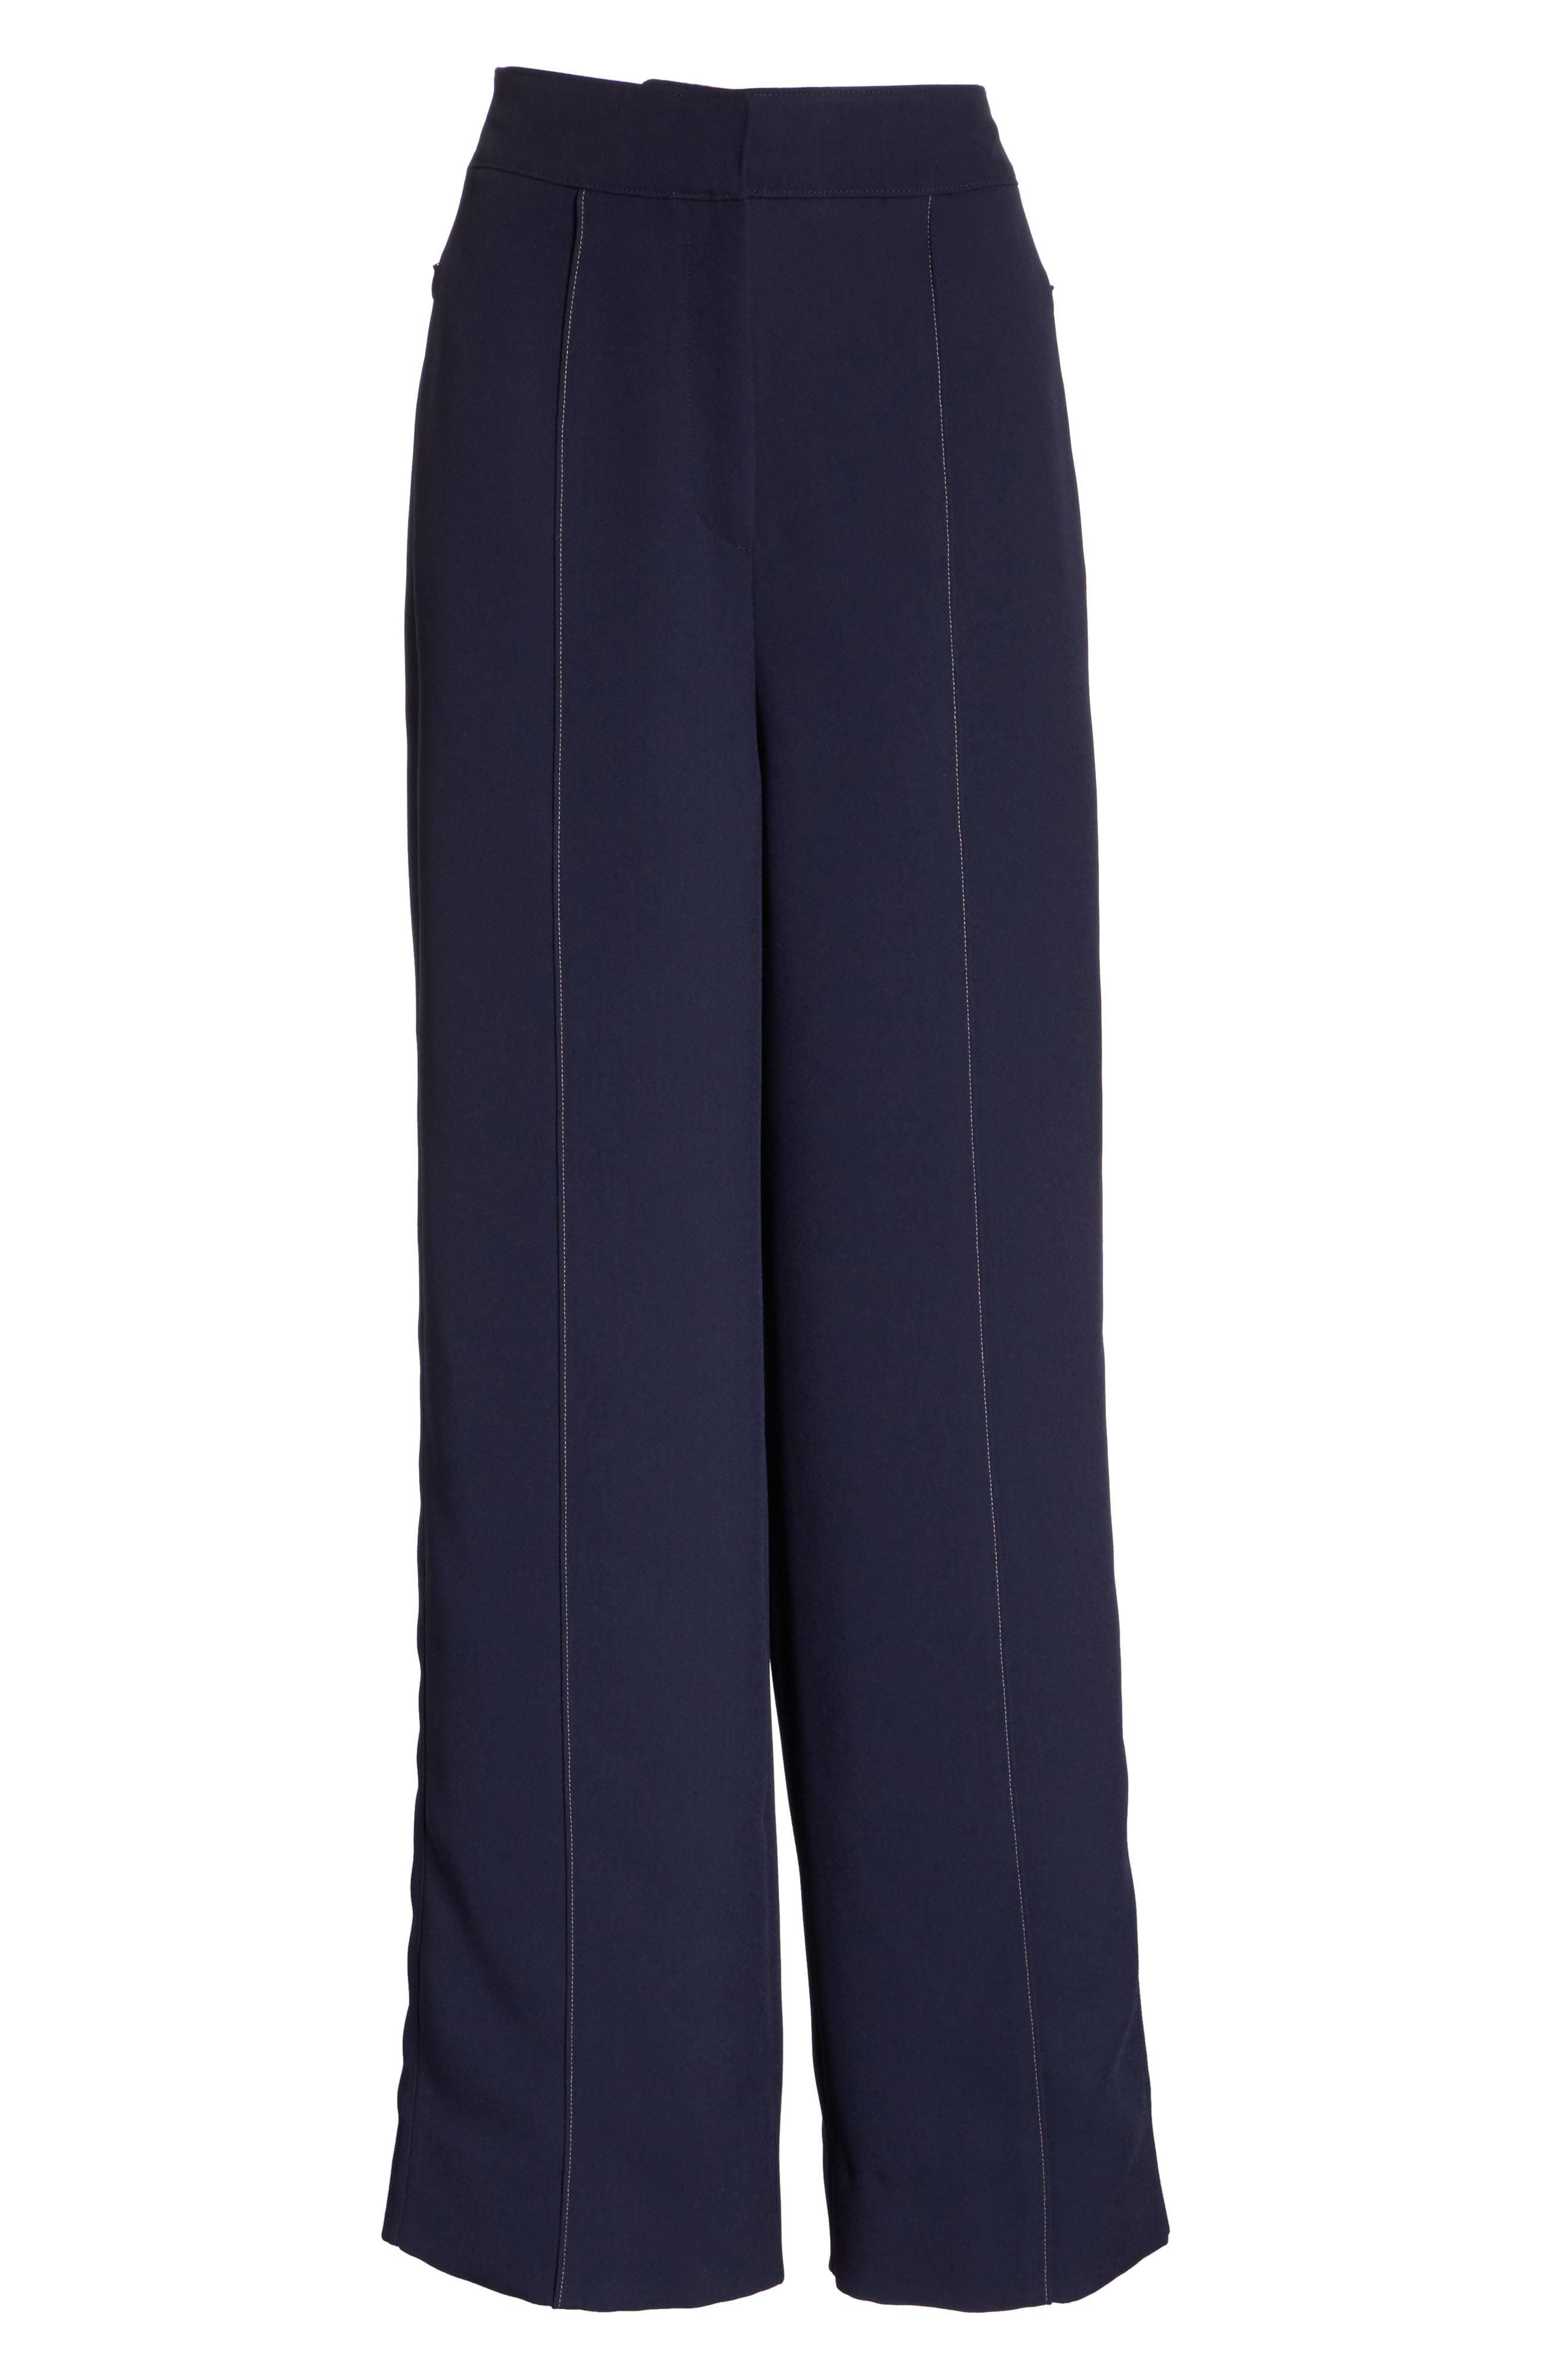 Lapari Pintuck Trousers,                             Alternate thumbnail 6, color,                             Navy